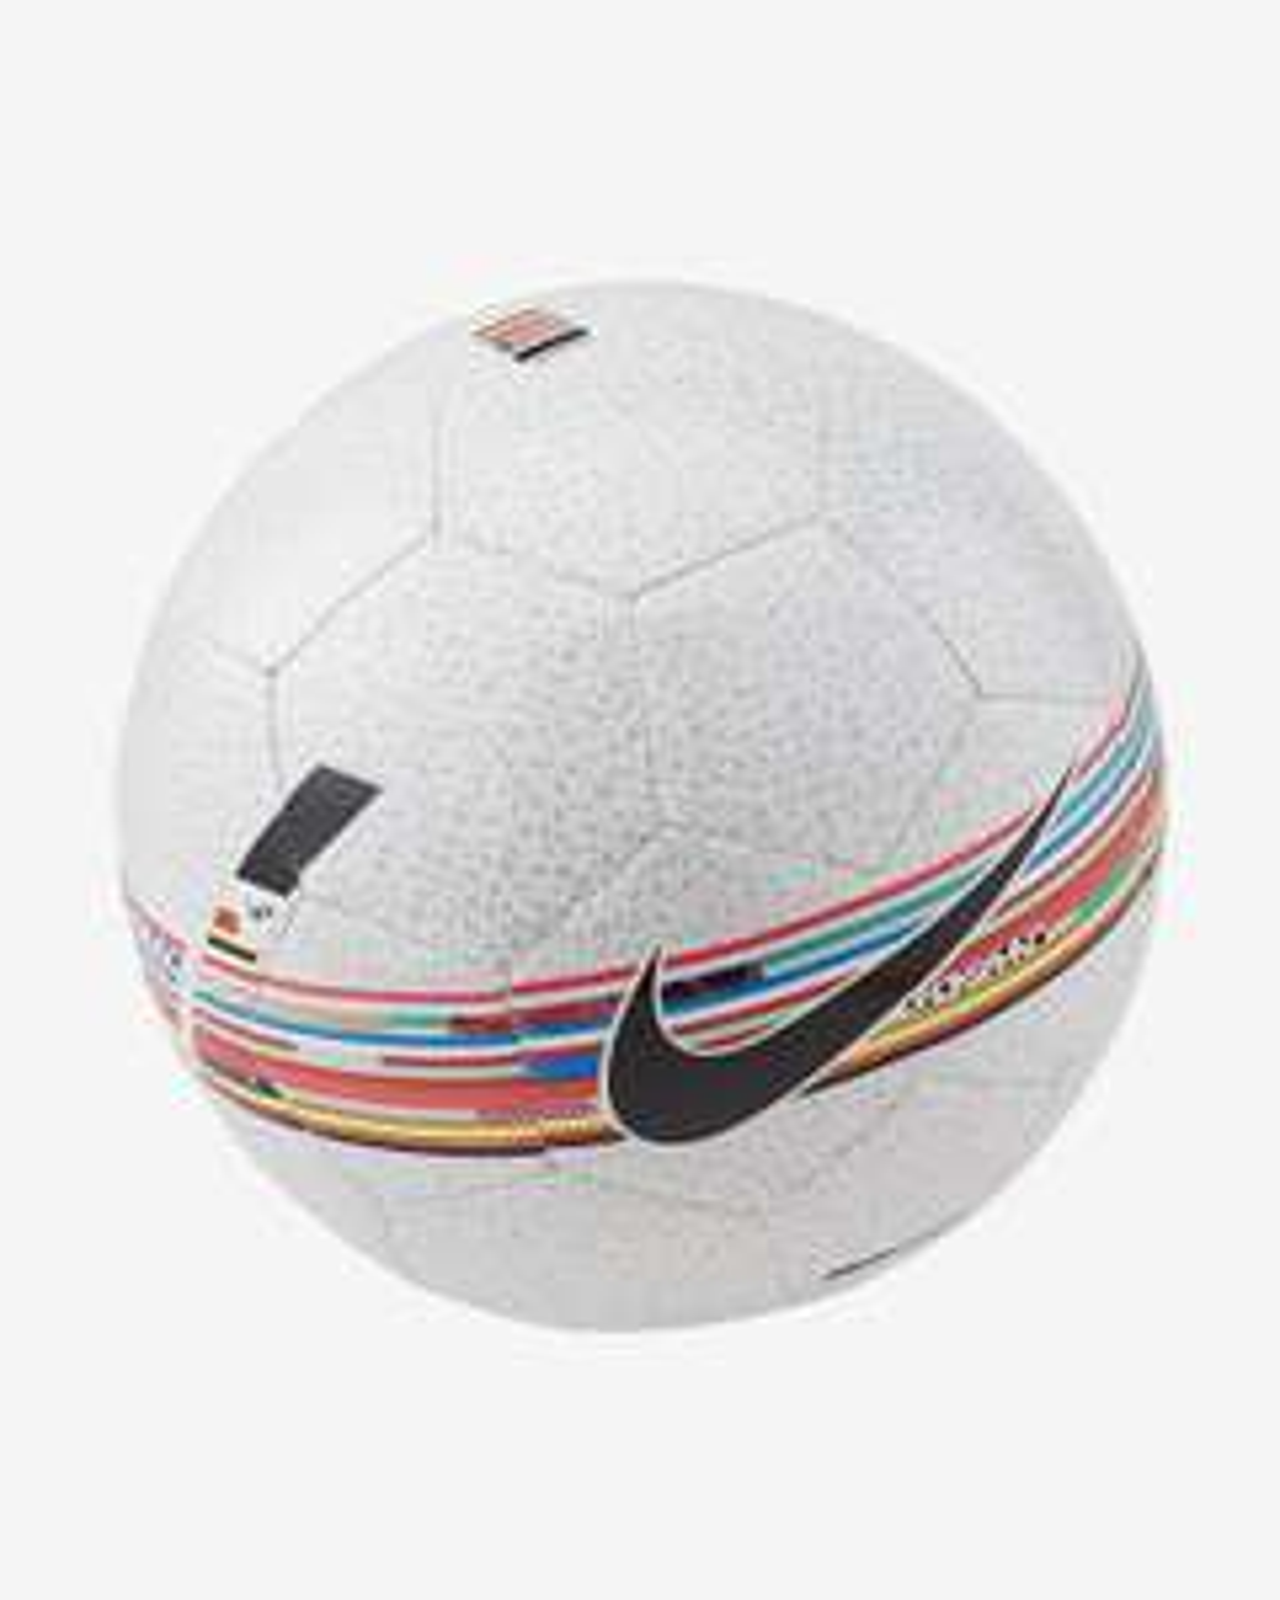 Nike Mercurial Prestige Football size 5, 4 was £21.95 now £11.98 @ Nike.com